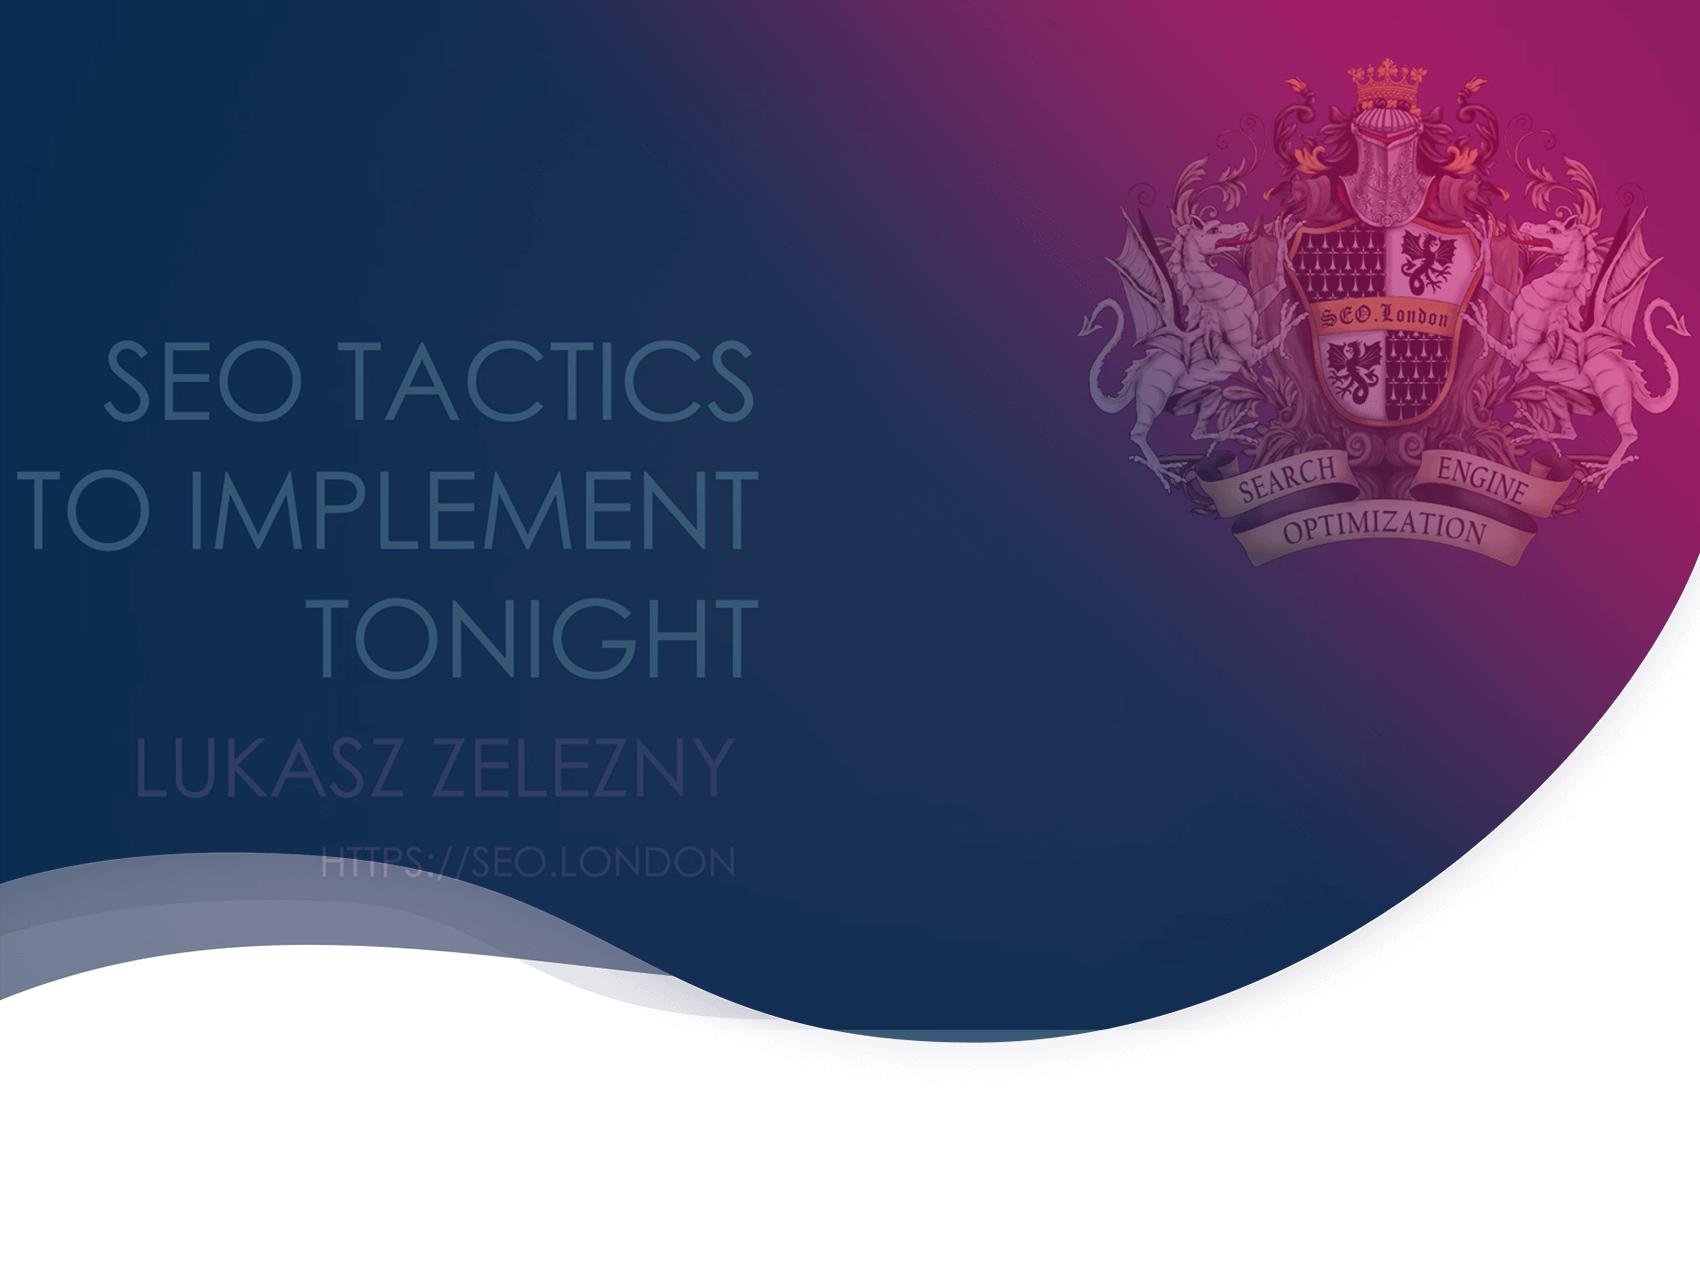 Lukasz Zelezny's 3 SEO tactics to boost your ranking